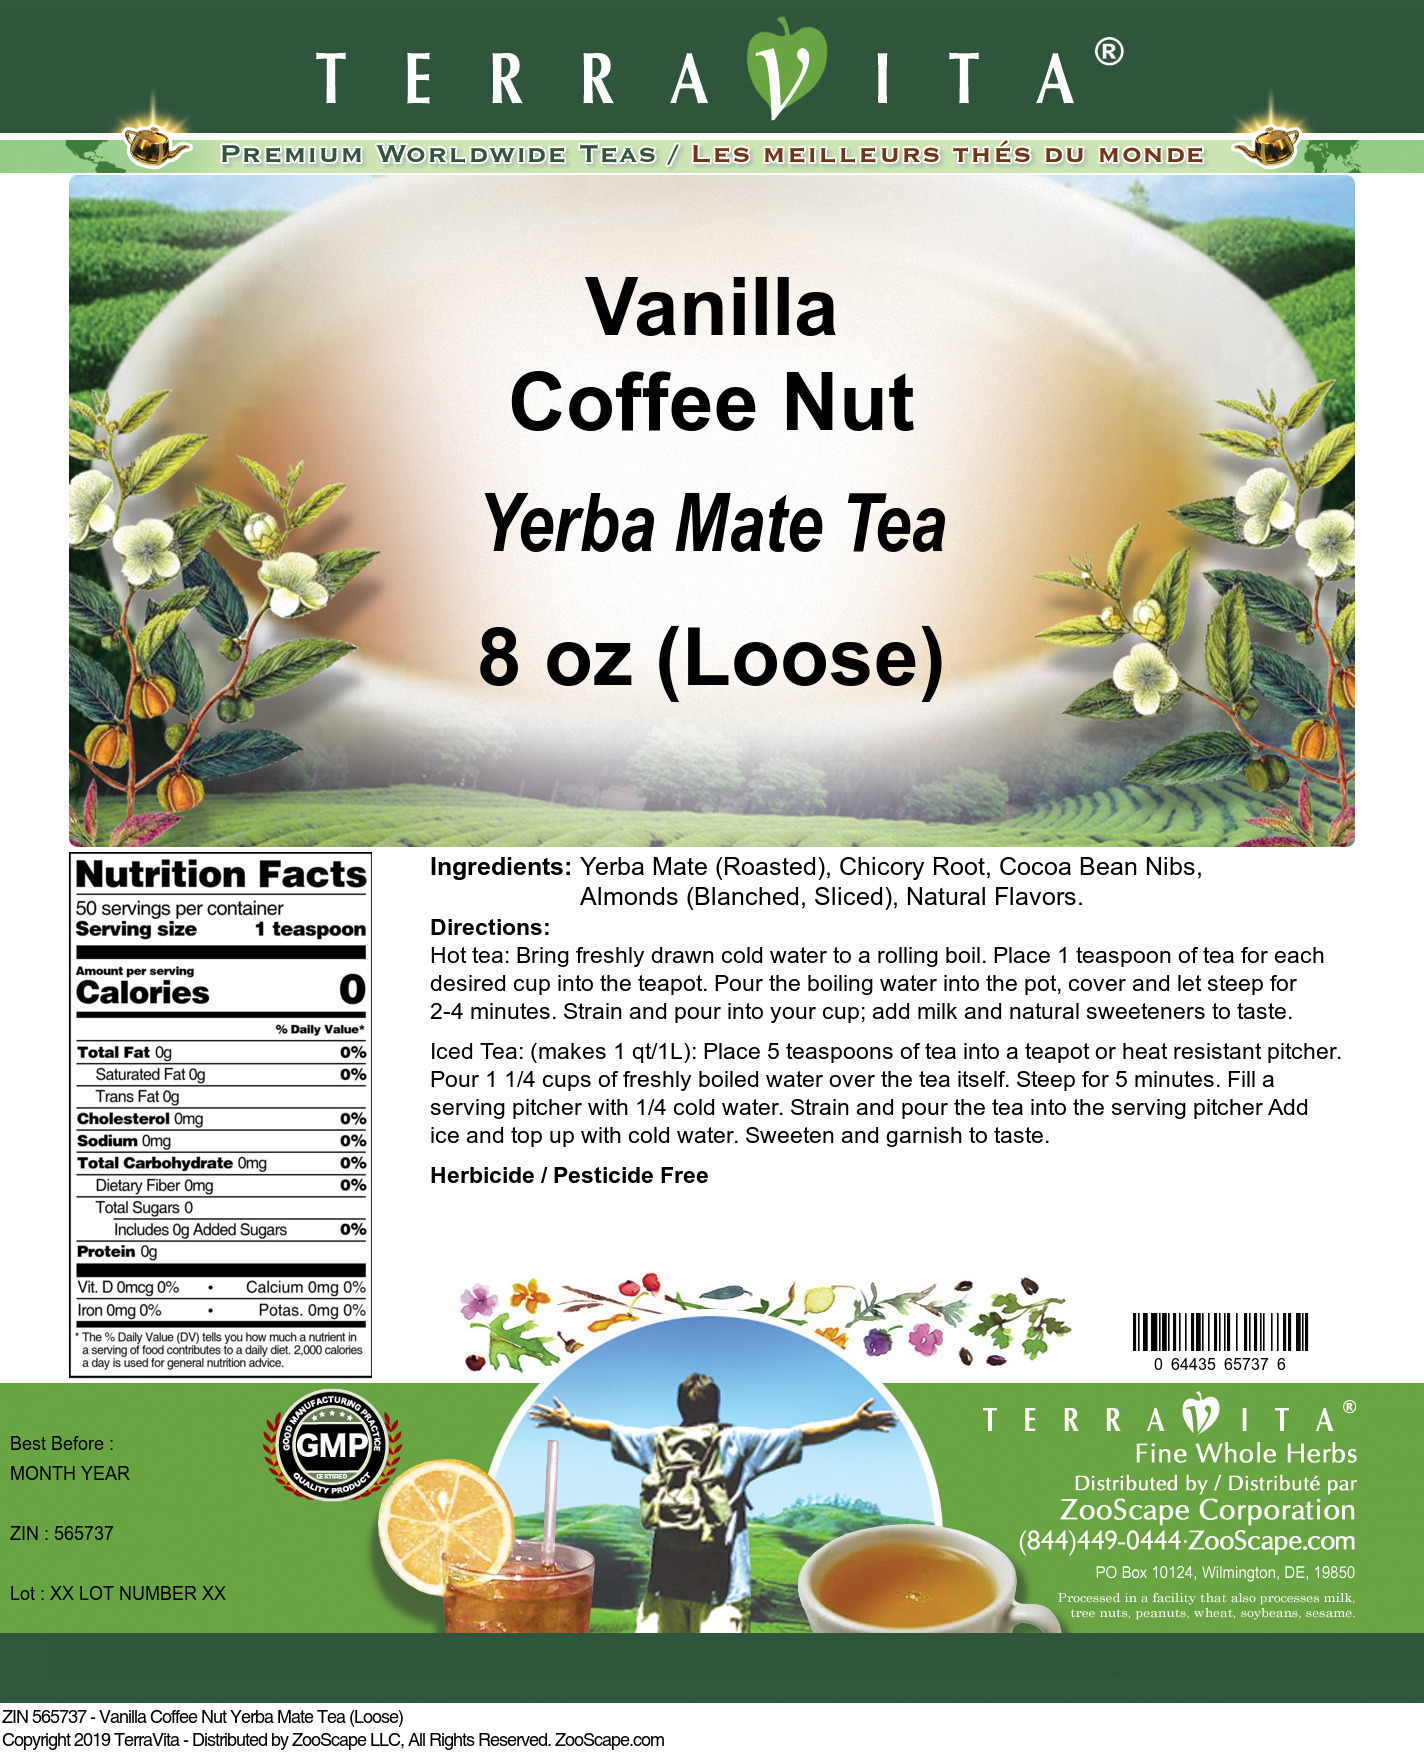 Vanilla Coffee Nut Yerba Mate